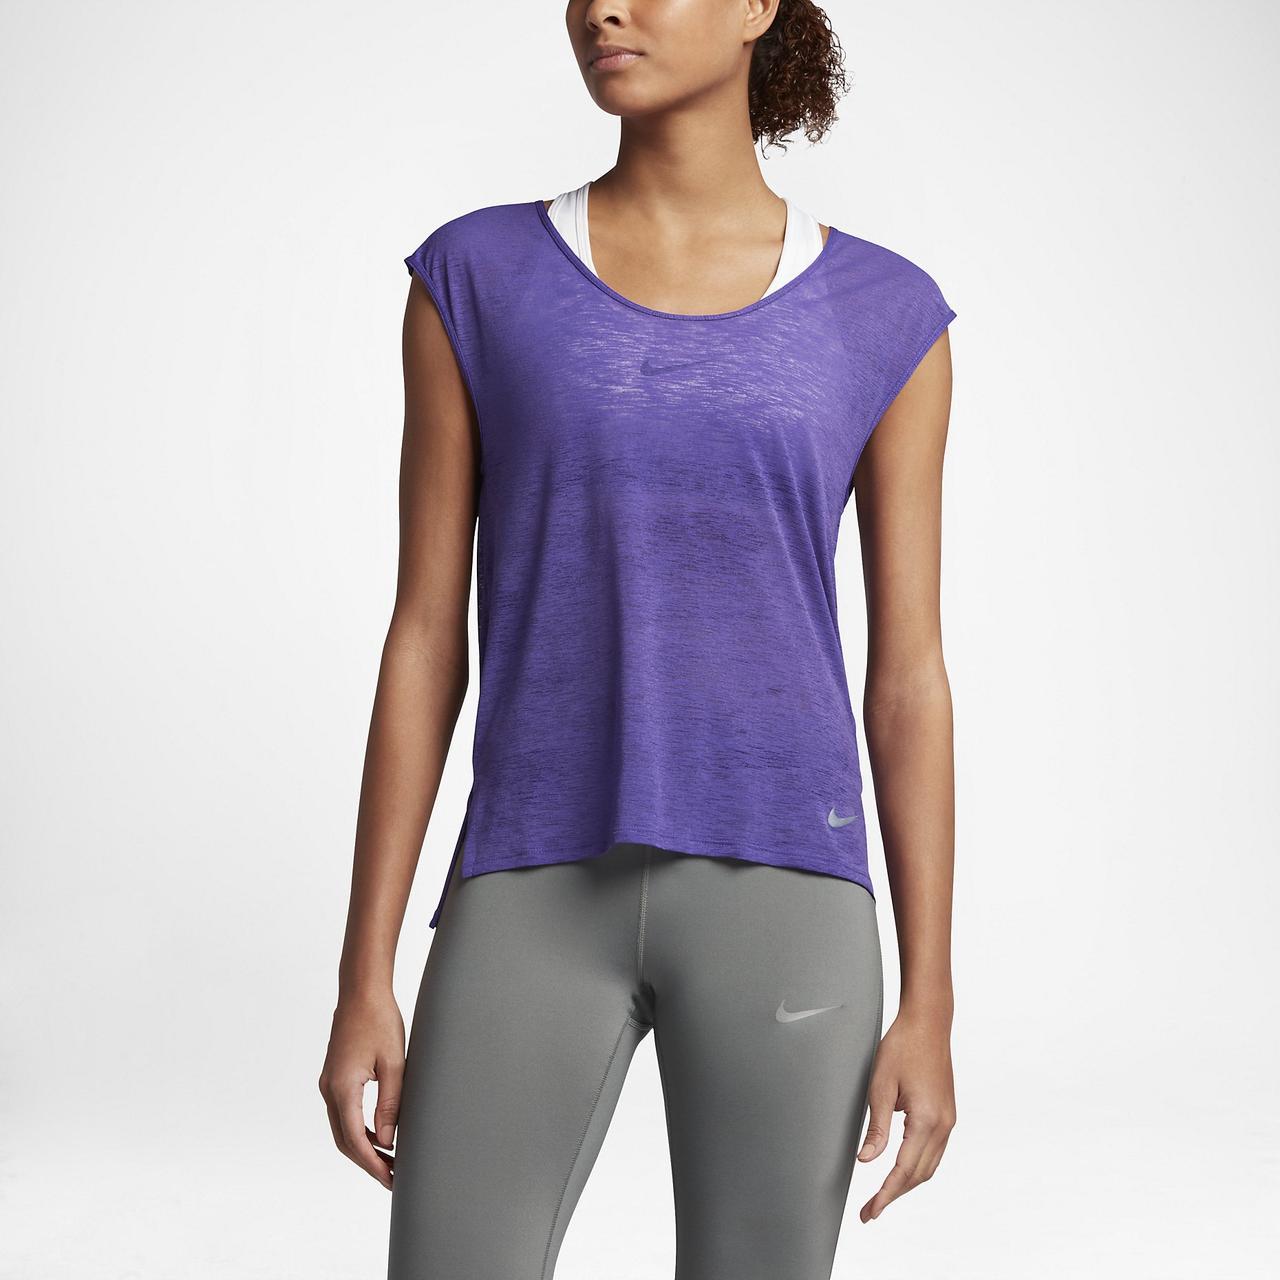 Женская футболка NIKE brthe top cool (831784-540)